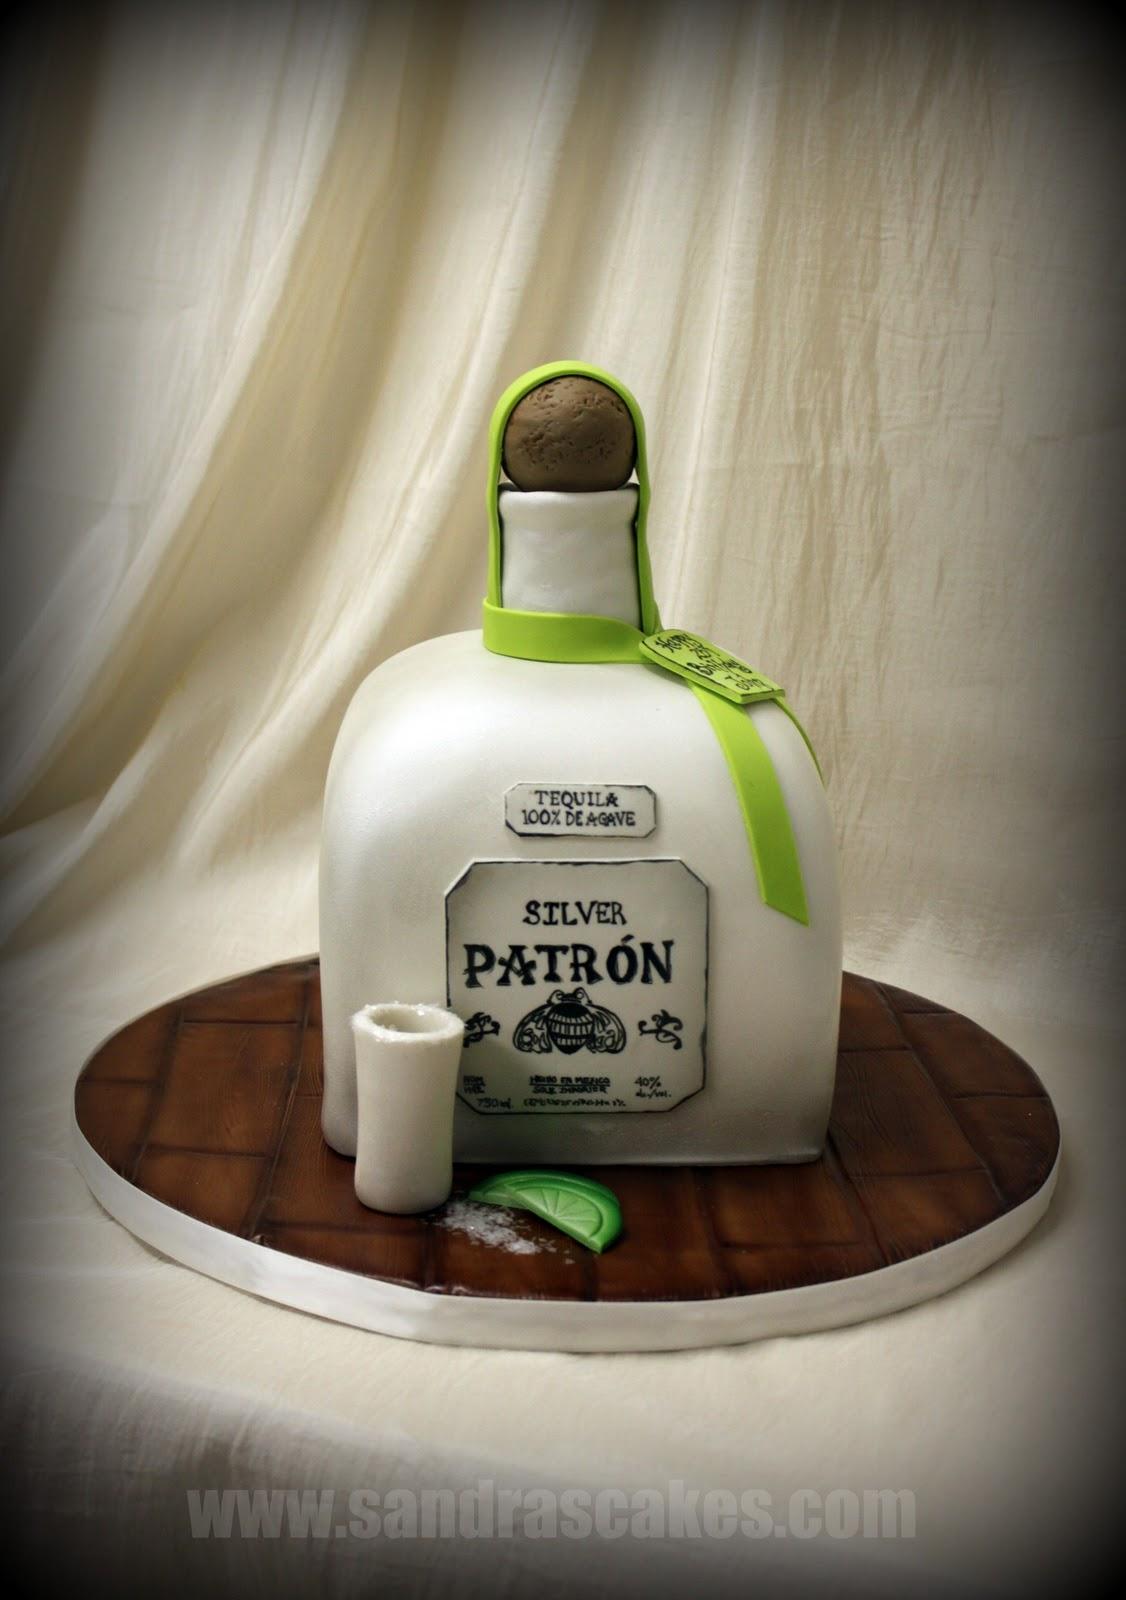 On Birthday Cakes Patron Birthday Cake - Patron birthday cake